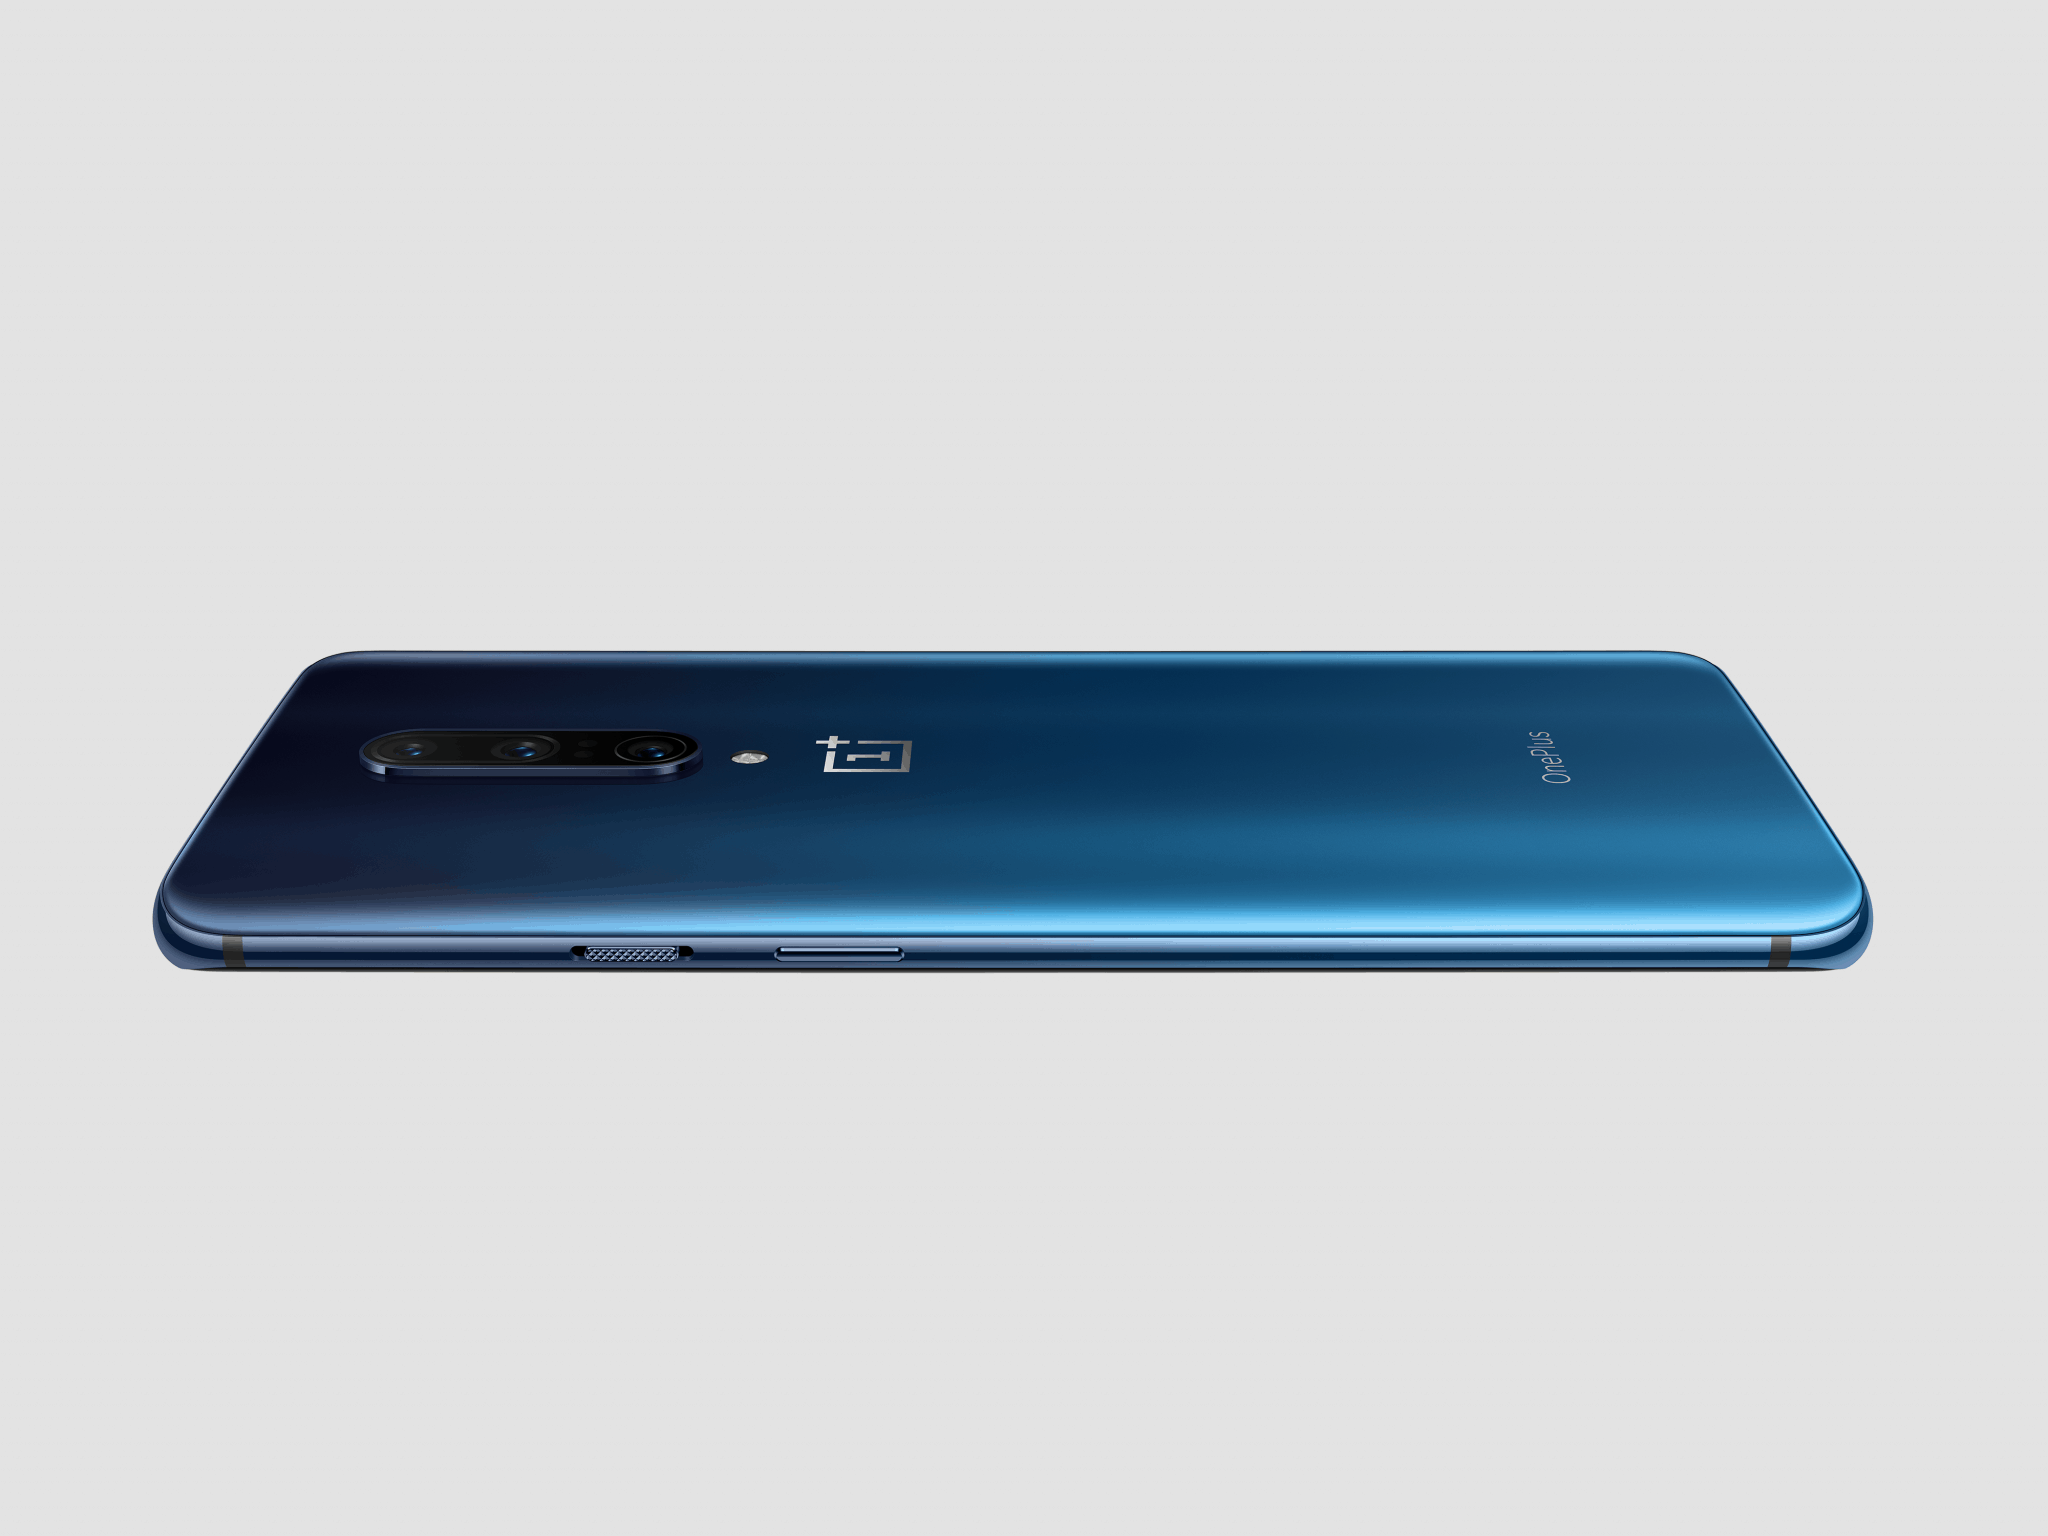 OnePlus 7 Pro - 8